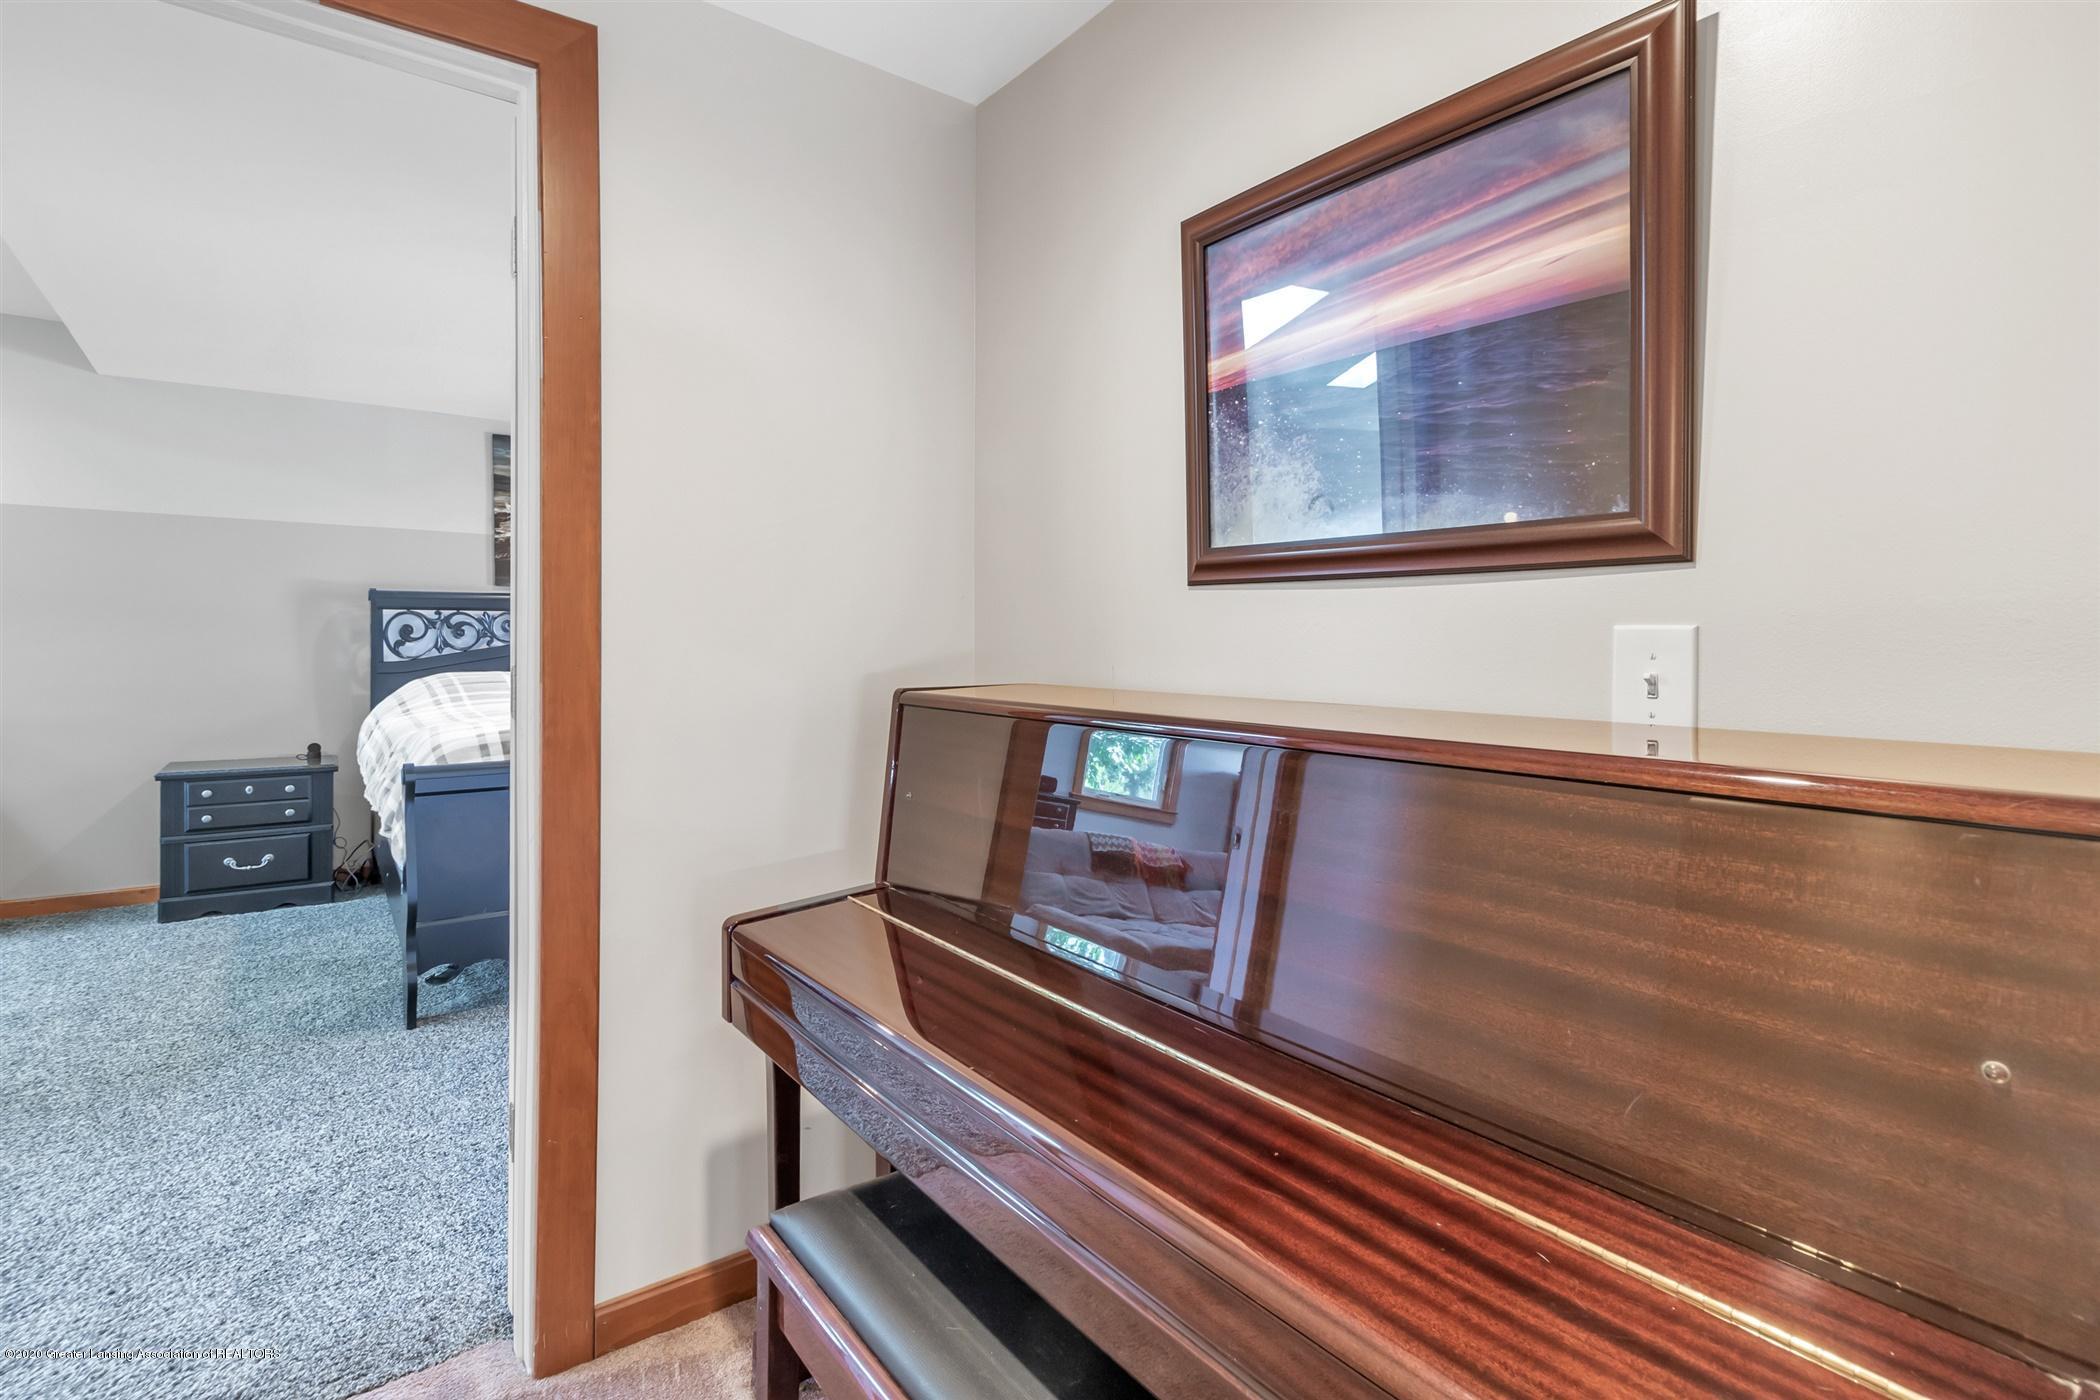 7346 W Cutler Rd - OFF 2ND BEDROOM - 32